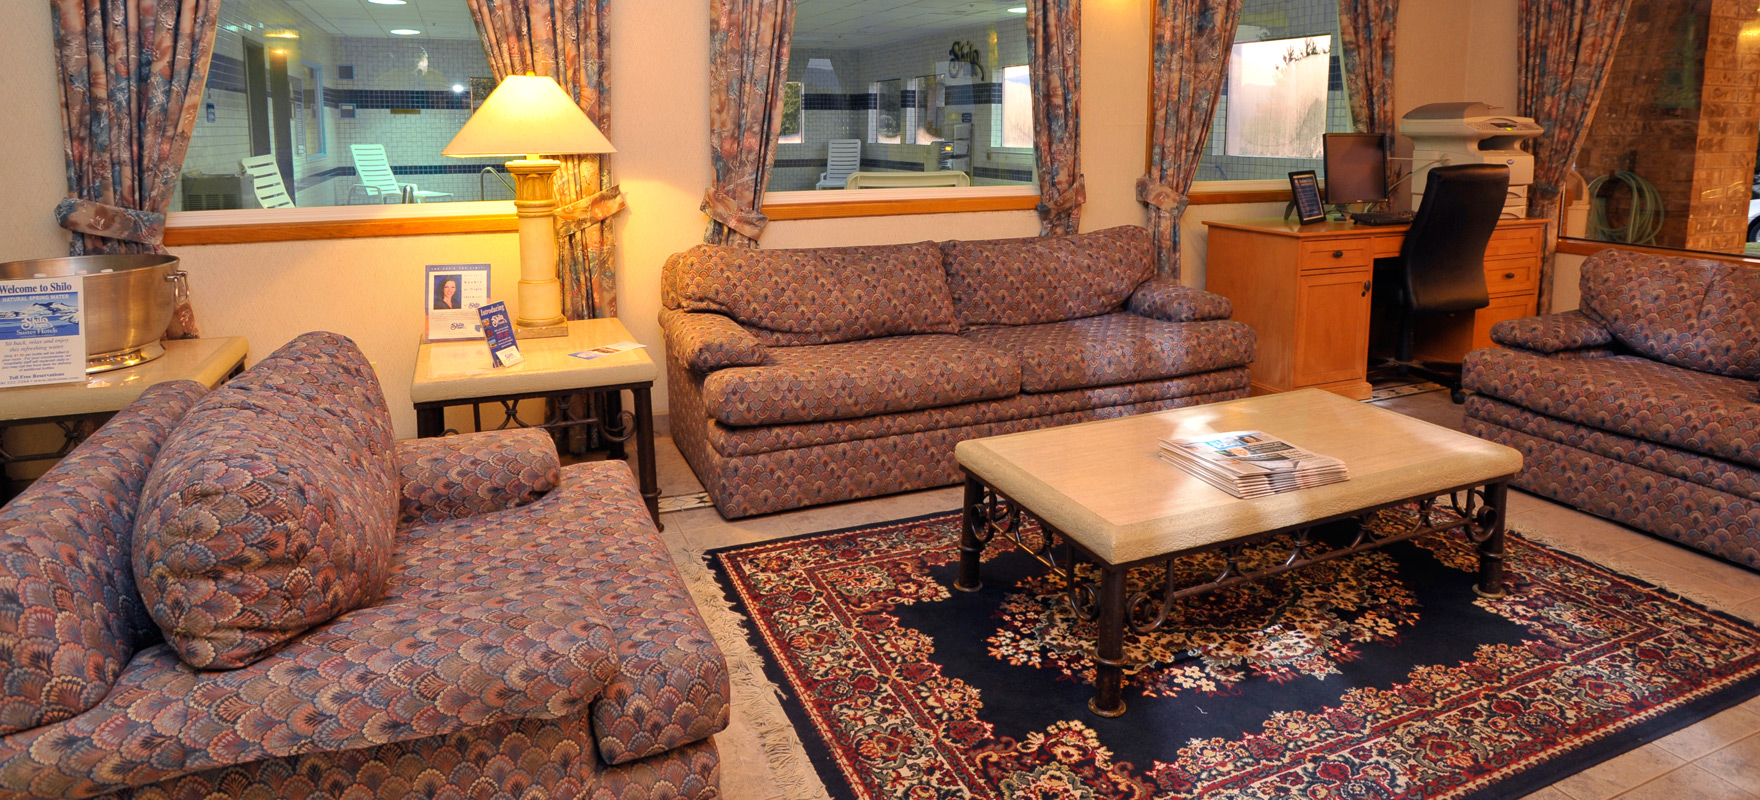 OFFICIAL WEBSITE - Shilo Inns Suites Hotels - Ocean Shores ...